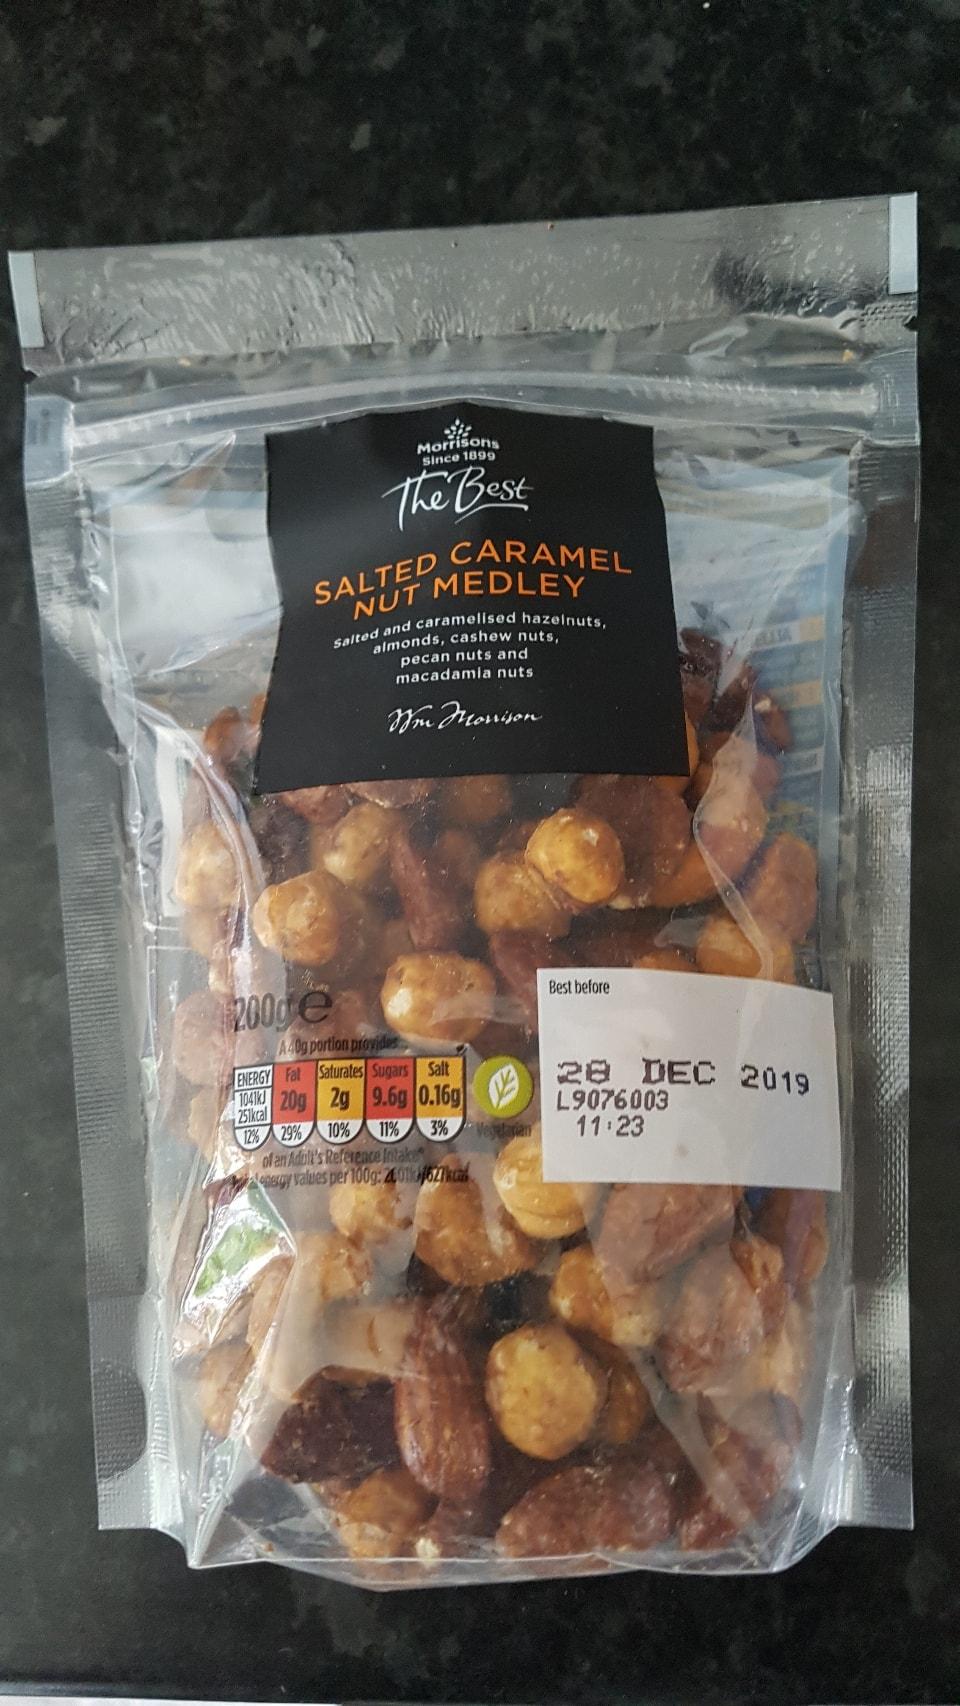 Salted caramel nut medley